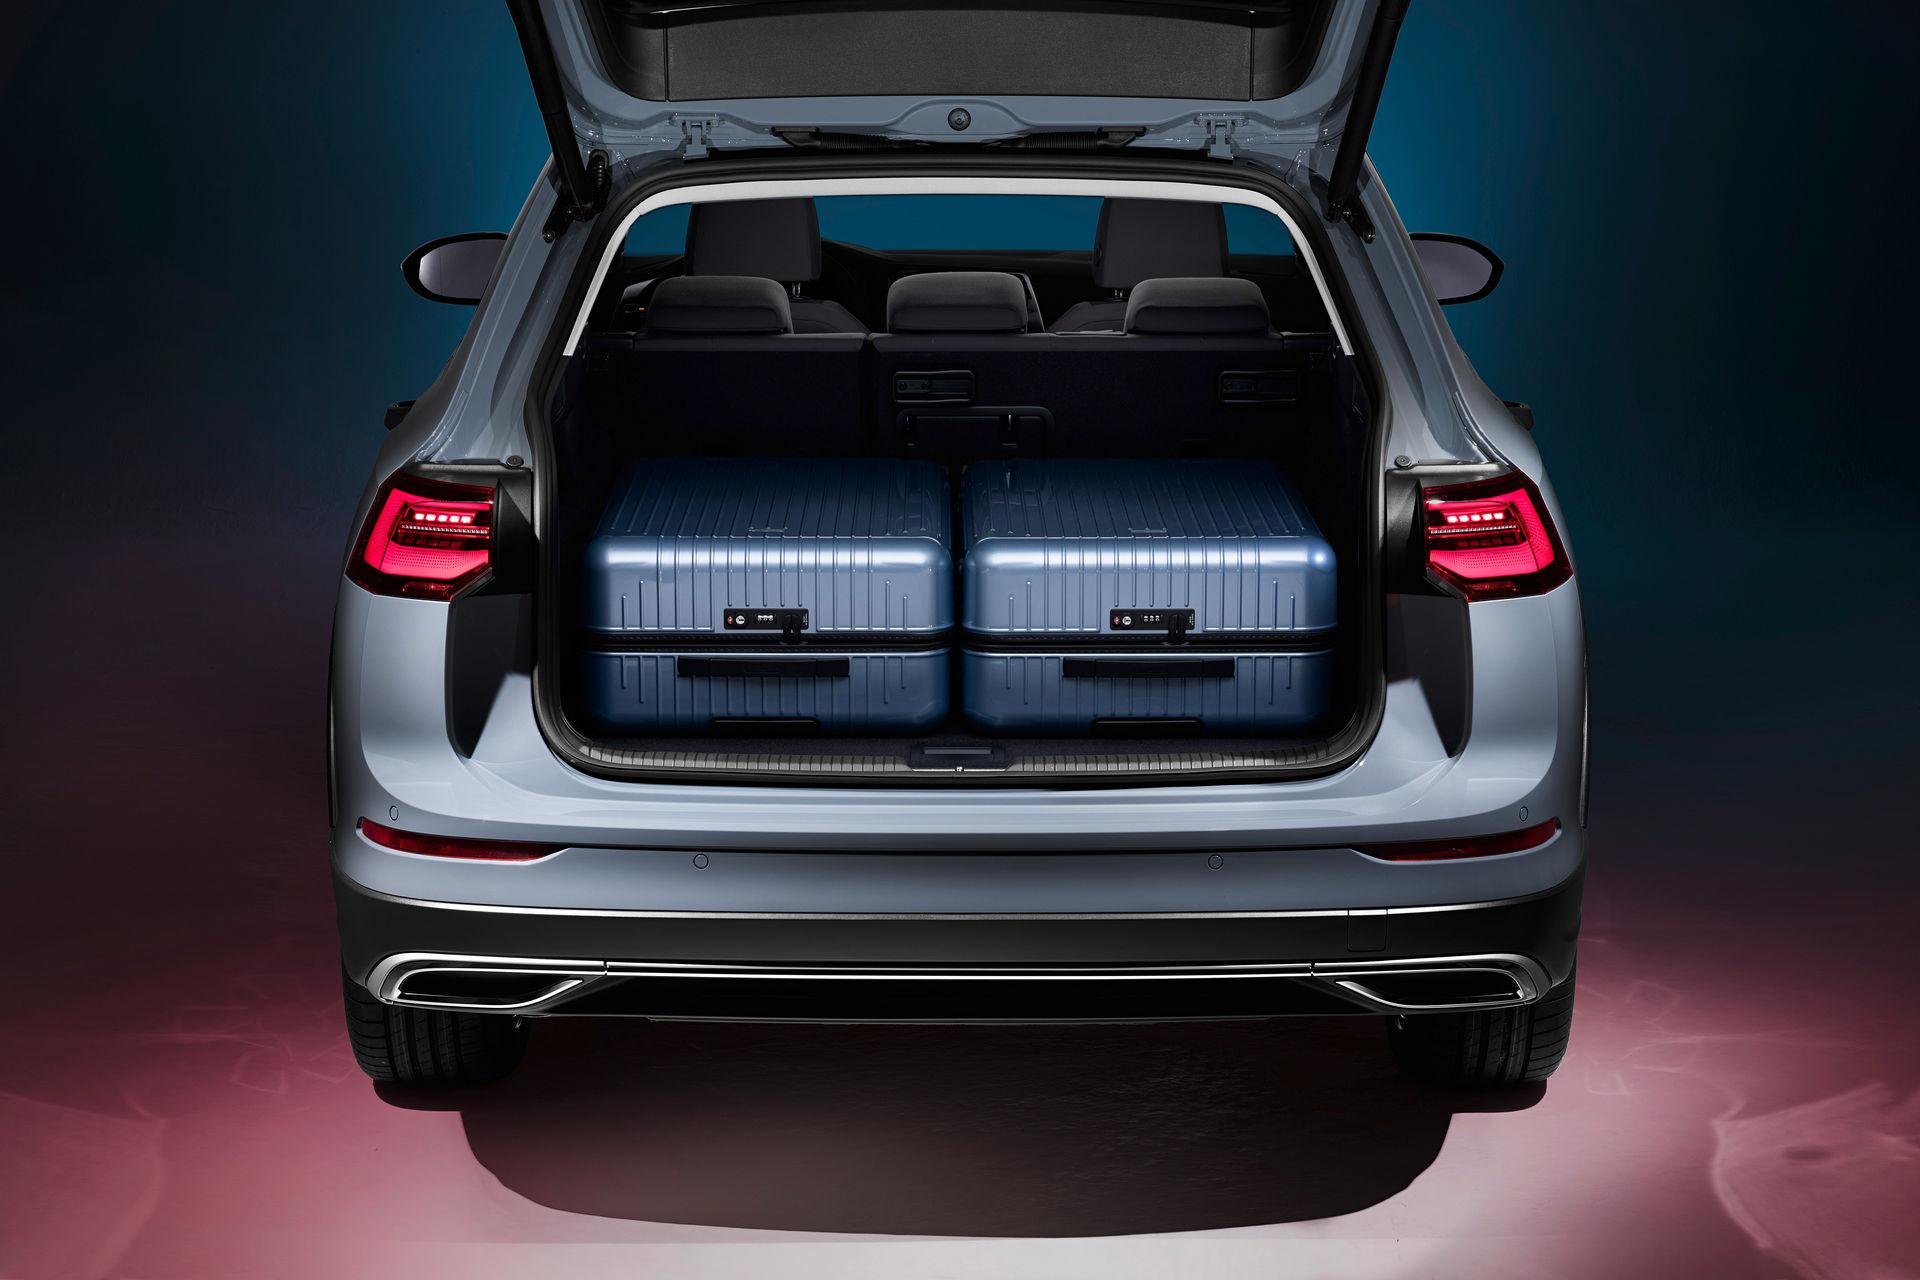 VW-Golf-Estate-And-Golf-Alltrack-5